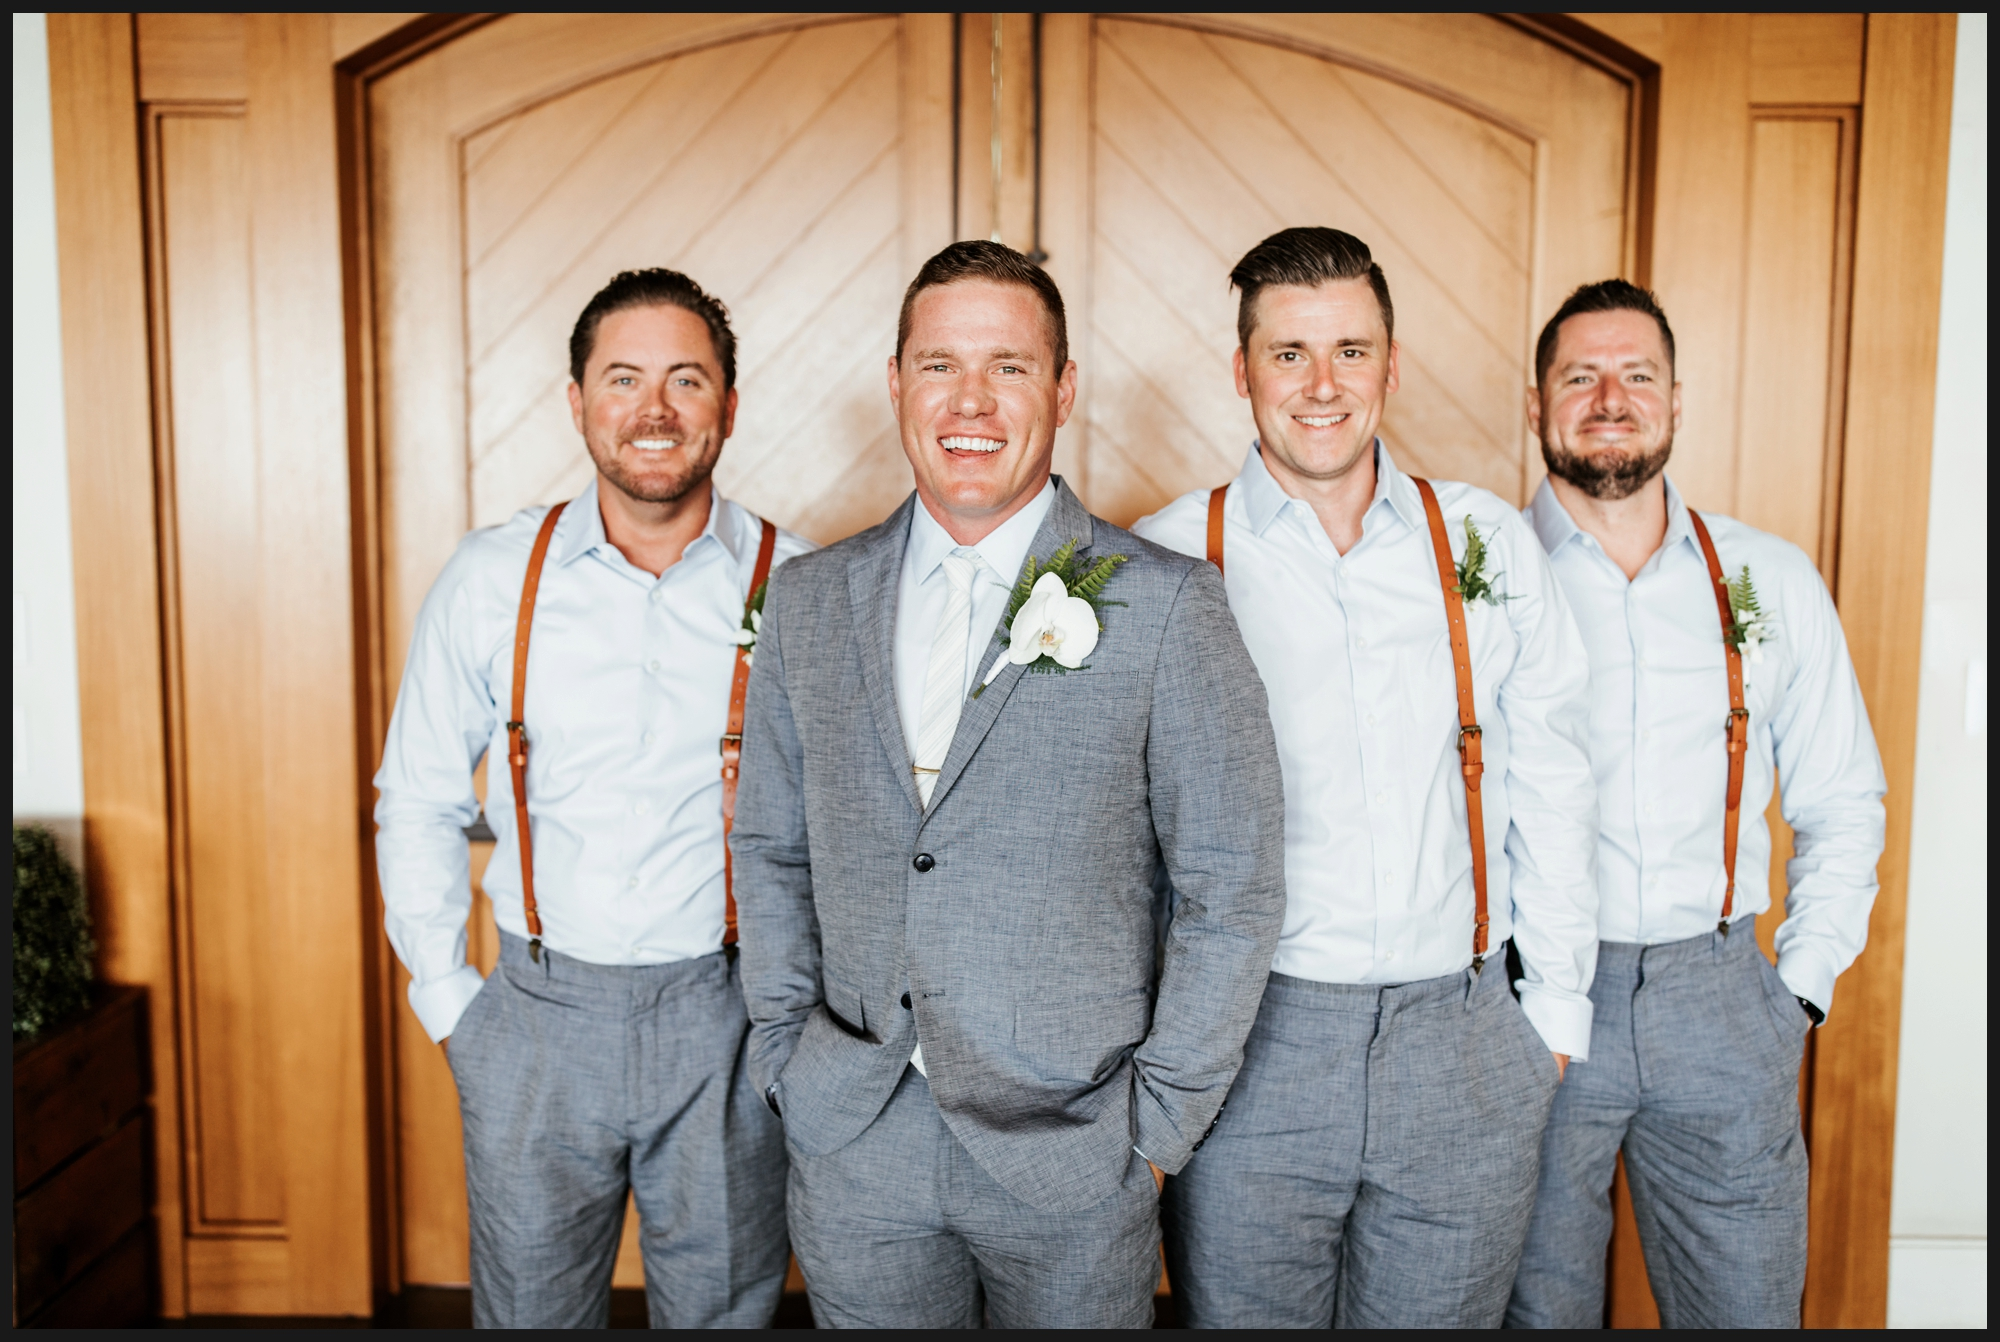 Orlando-Wedding-Photographer-destination-wedding-photographer-florida-wedding-photographer-hawaii-wedding-photographer_0042.jpg